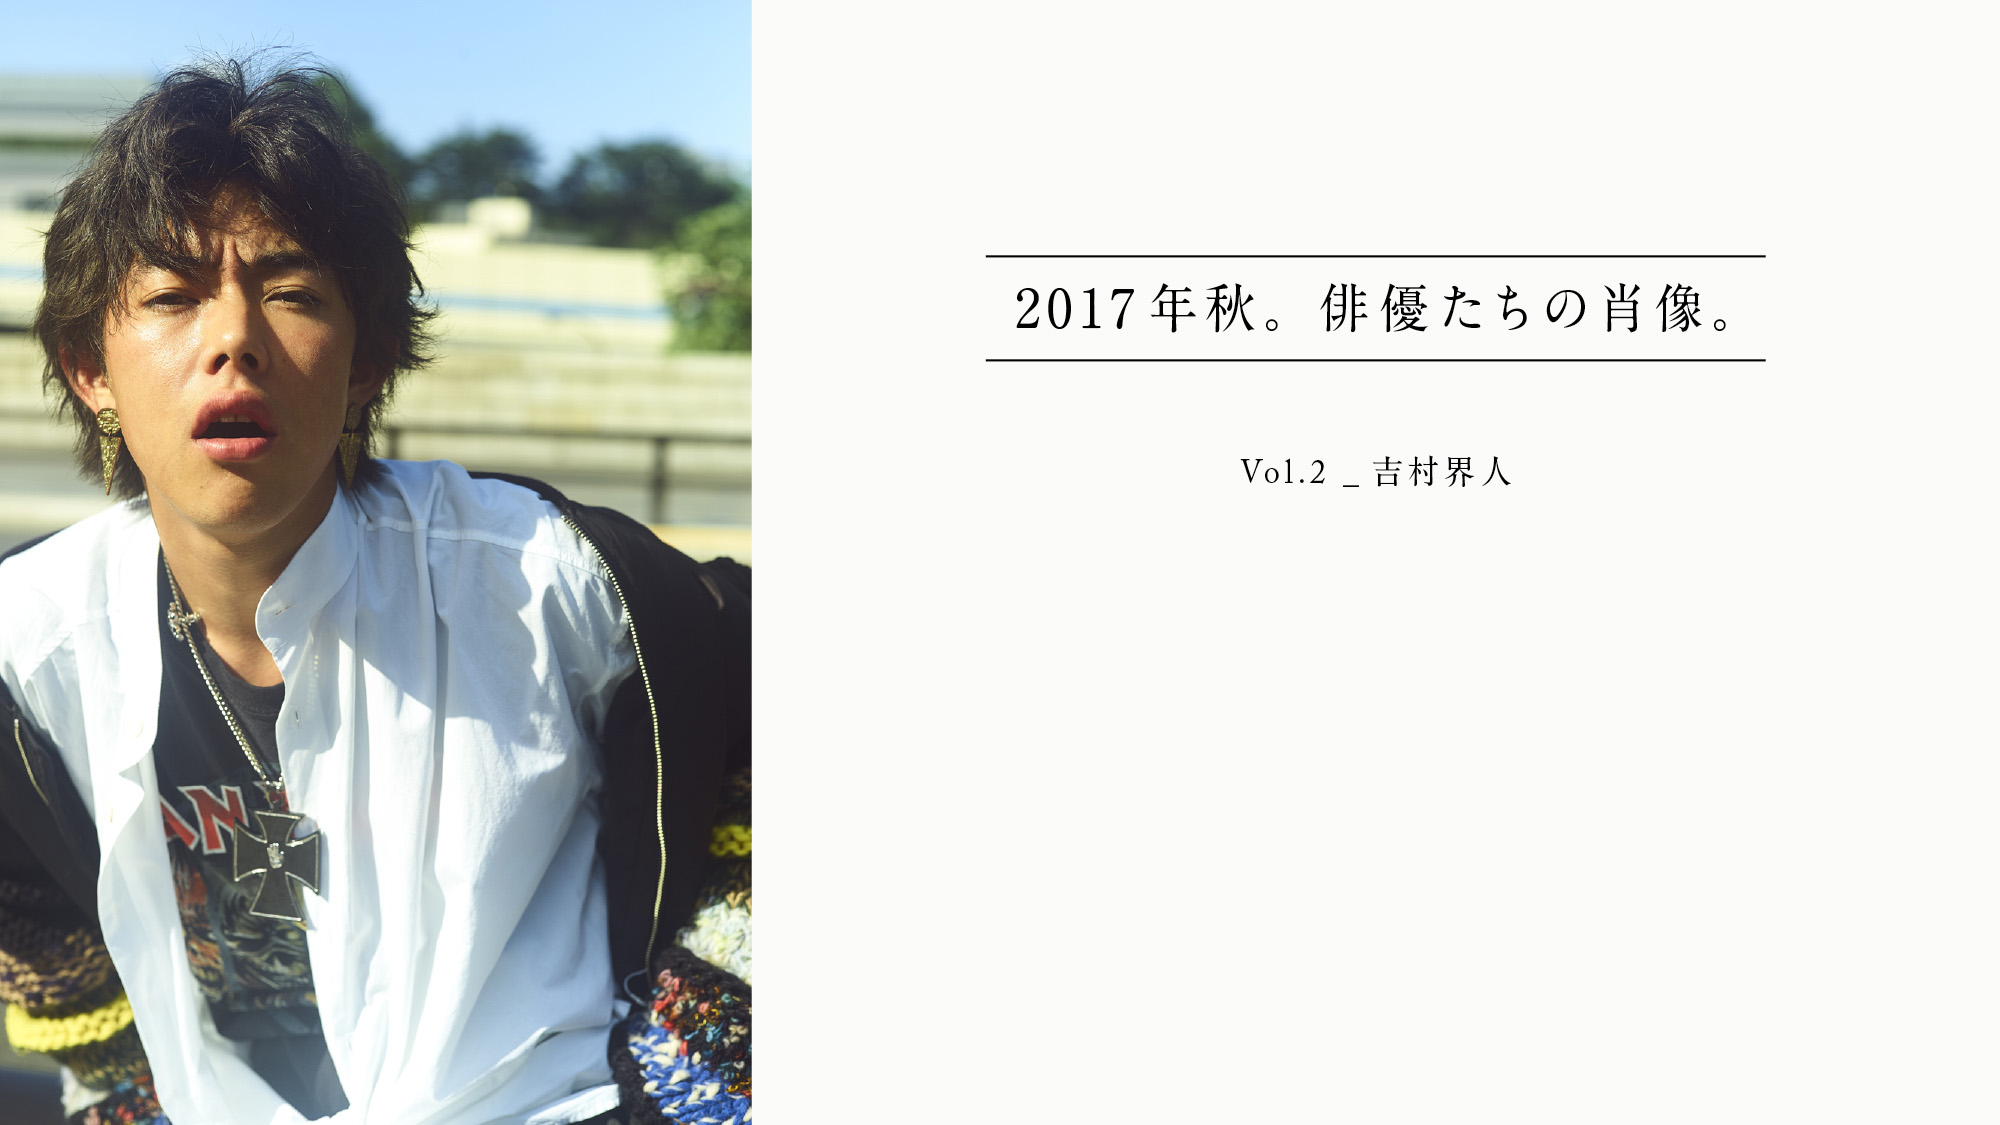 1005_hynm_haiyu_yoshimura_Brand_1200_675_2